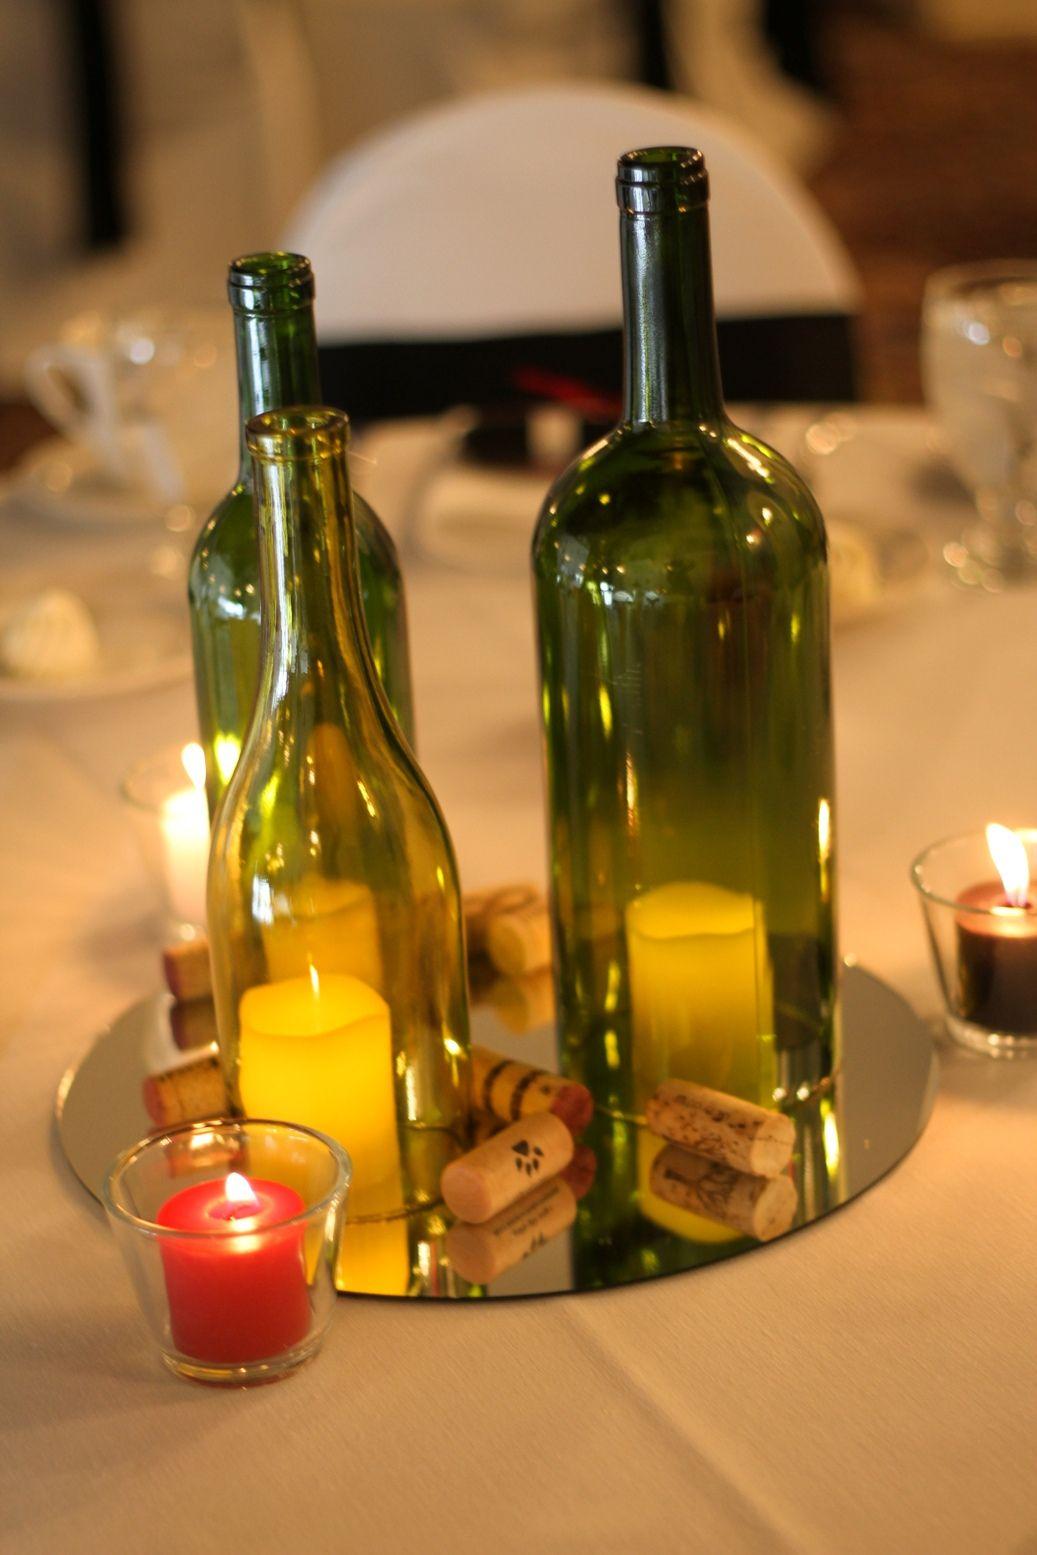 Diy wine bottle centerpiece wine bottle centerpieces for Homemade wine bottle centerpieces